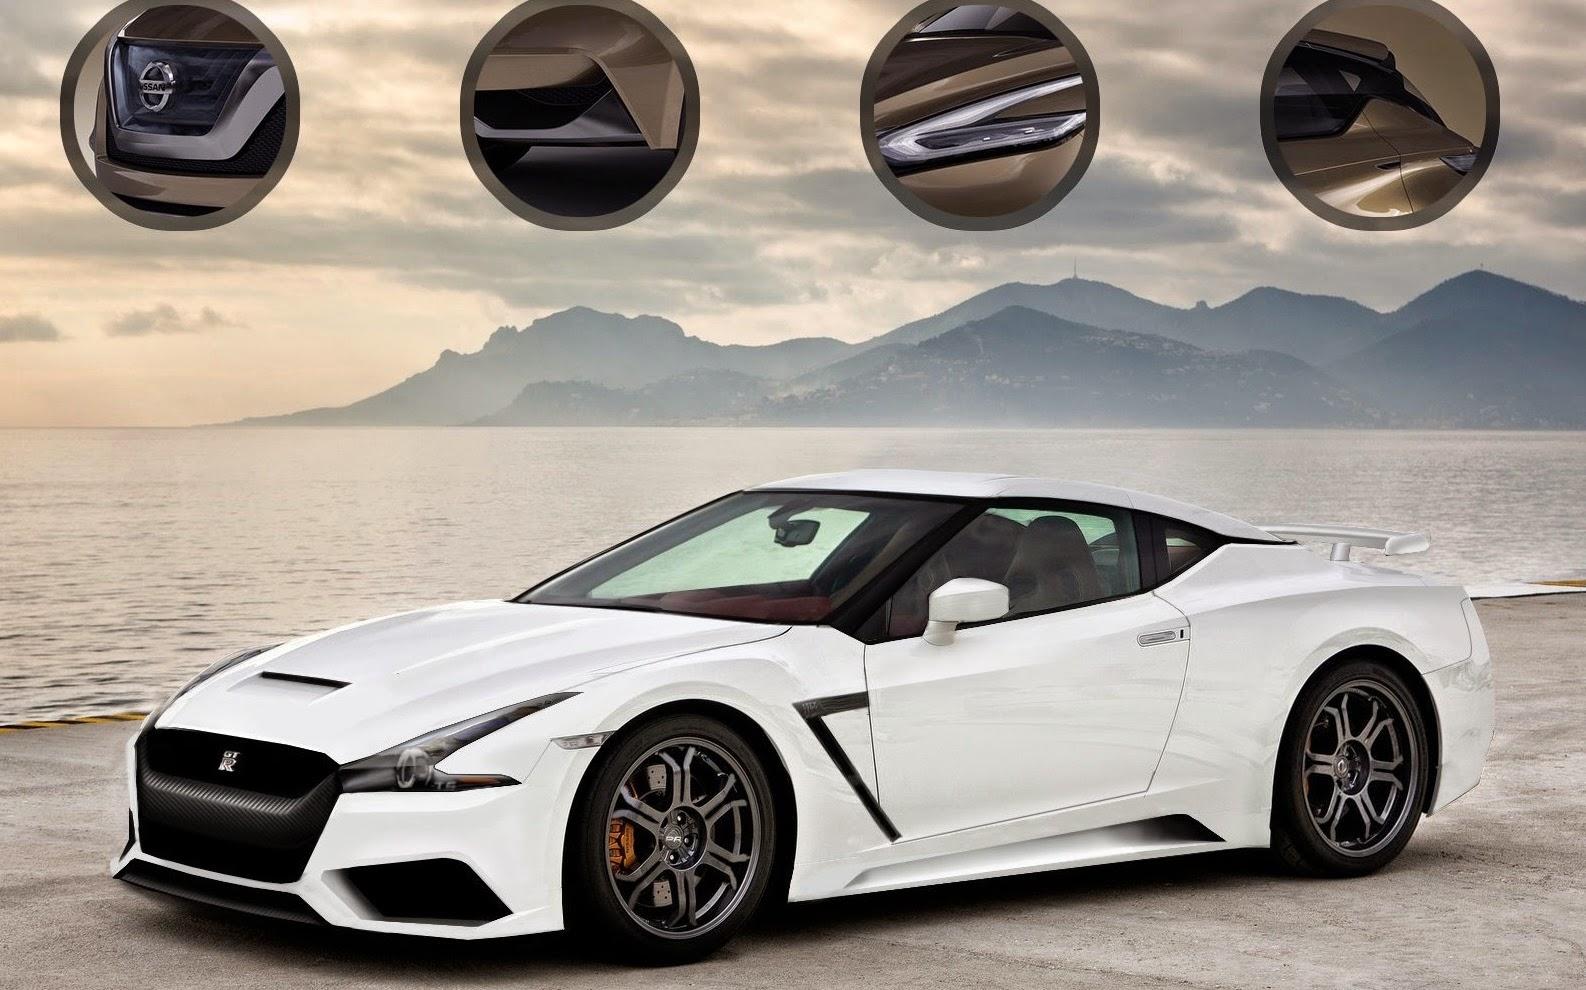 2016 Nissan GTR Design